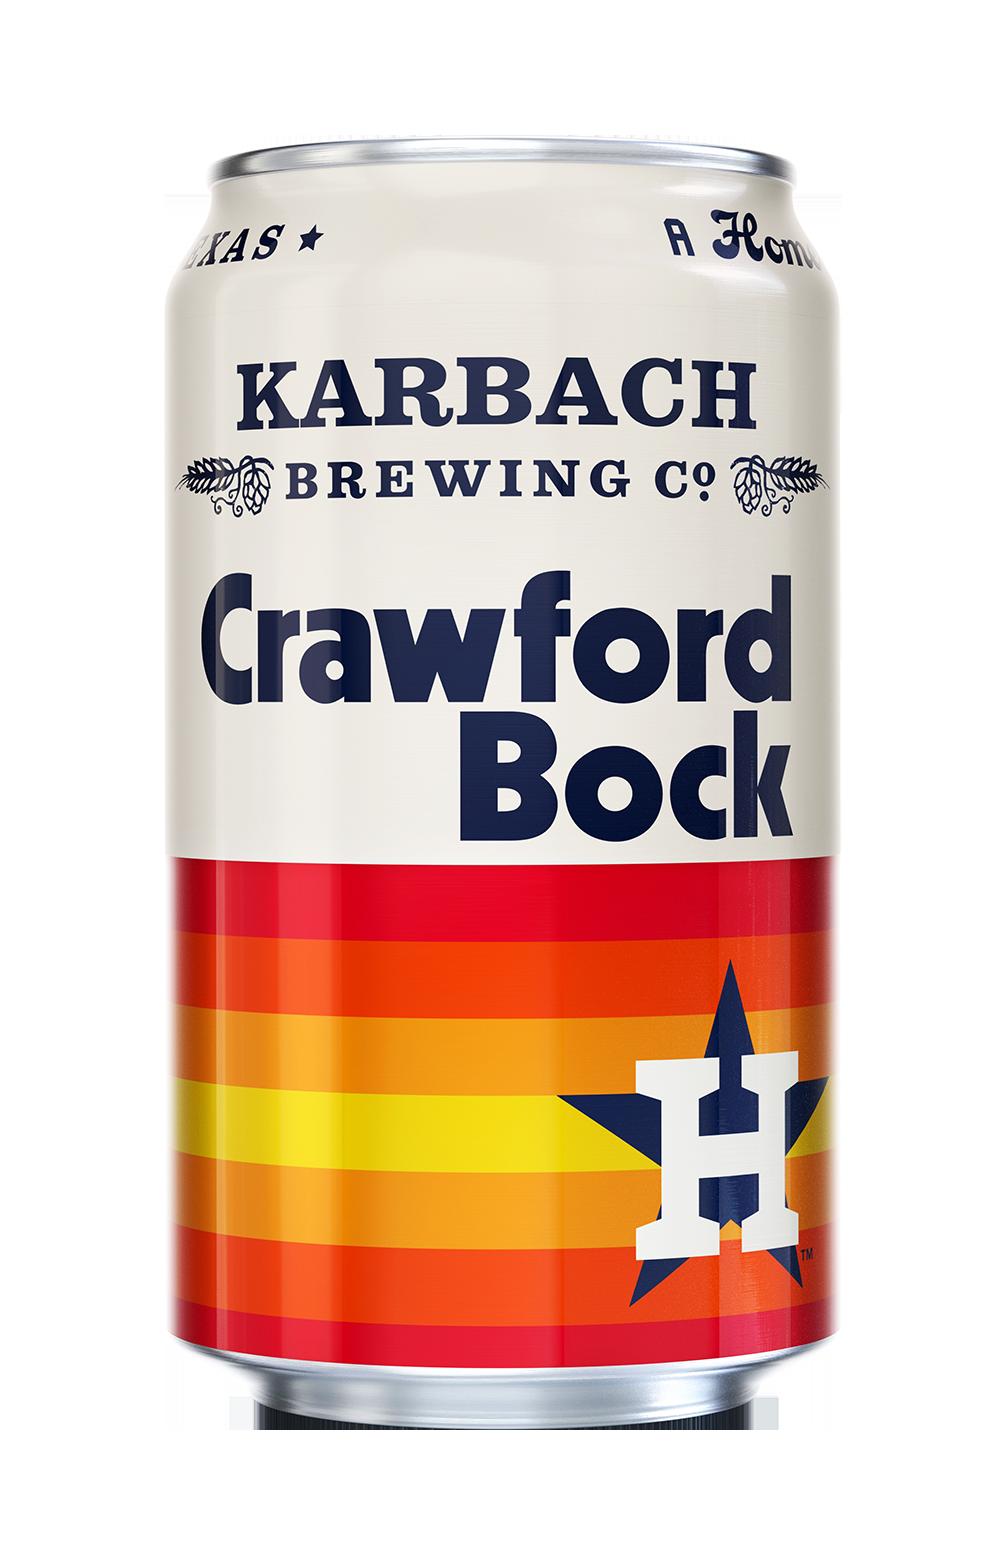 Crawford Bock – Karbach Brewing Co